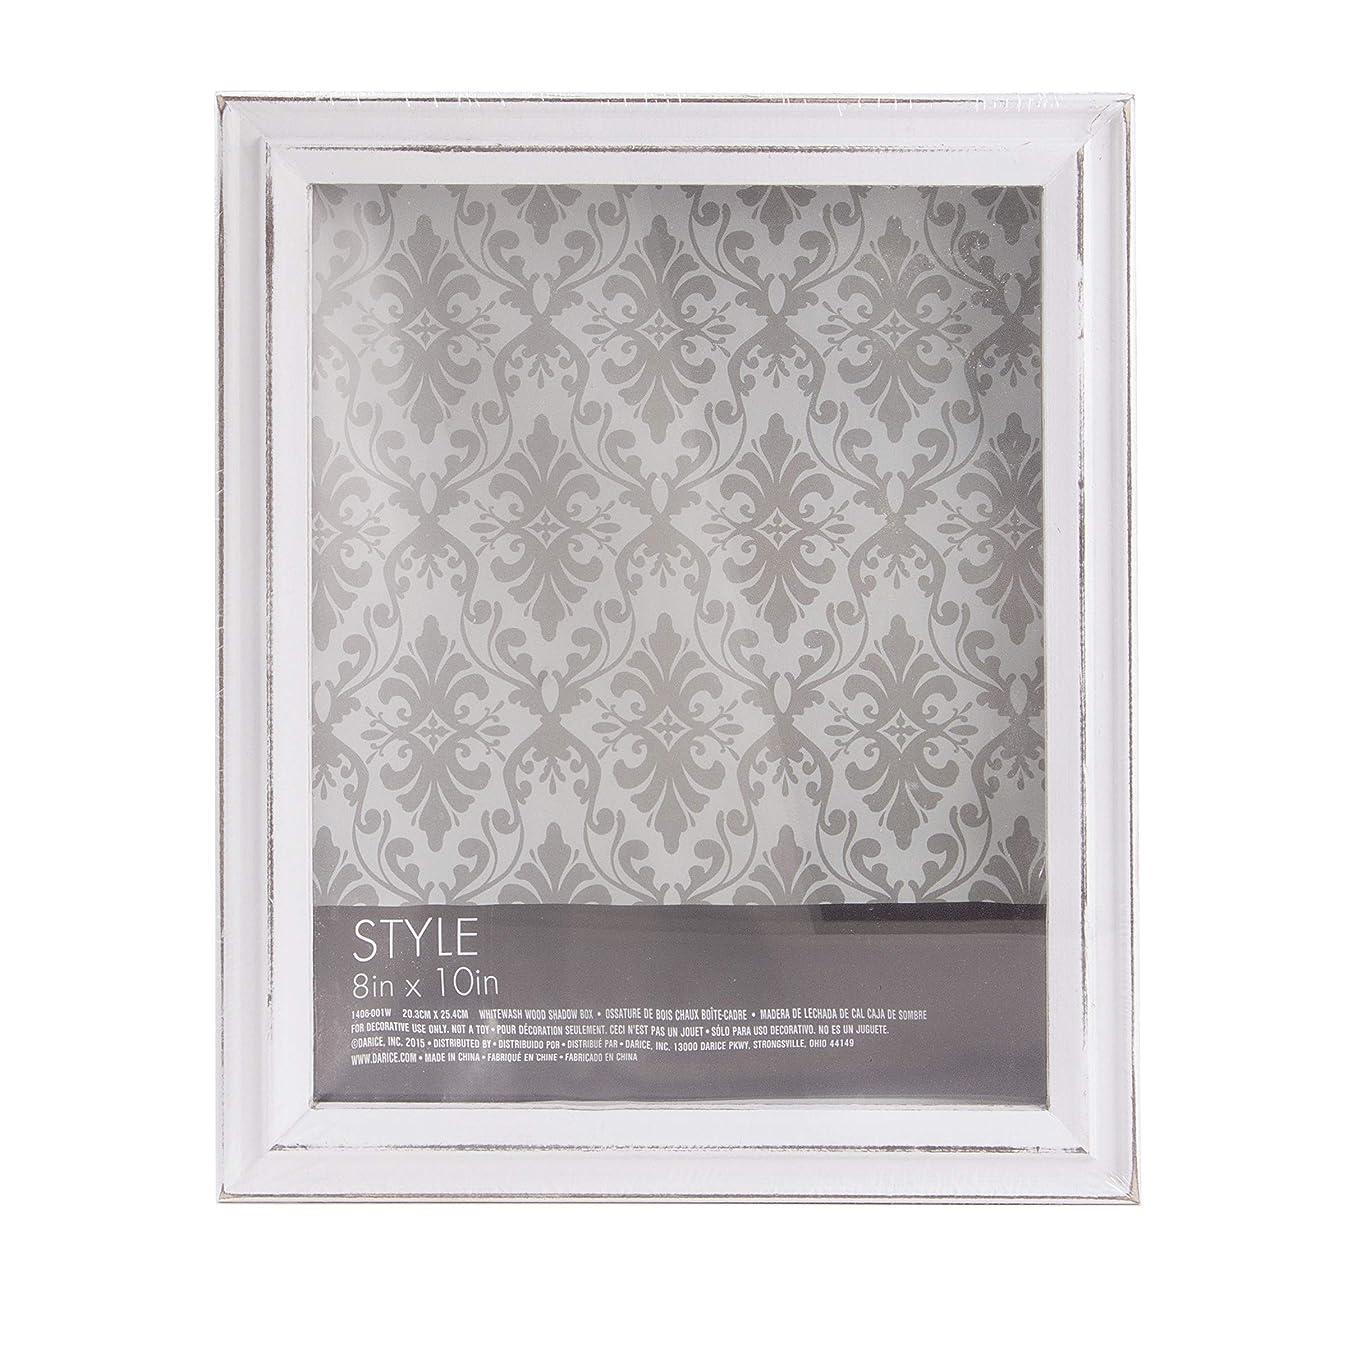 Darice White Shadow Box Frame: Whitewashed Wood, 8 x 10 inches